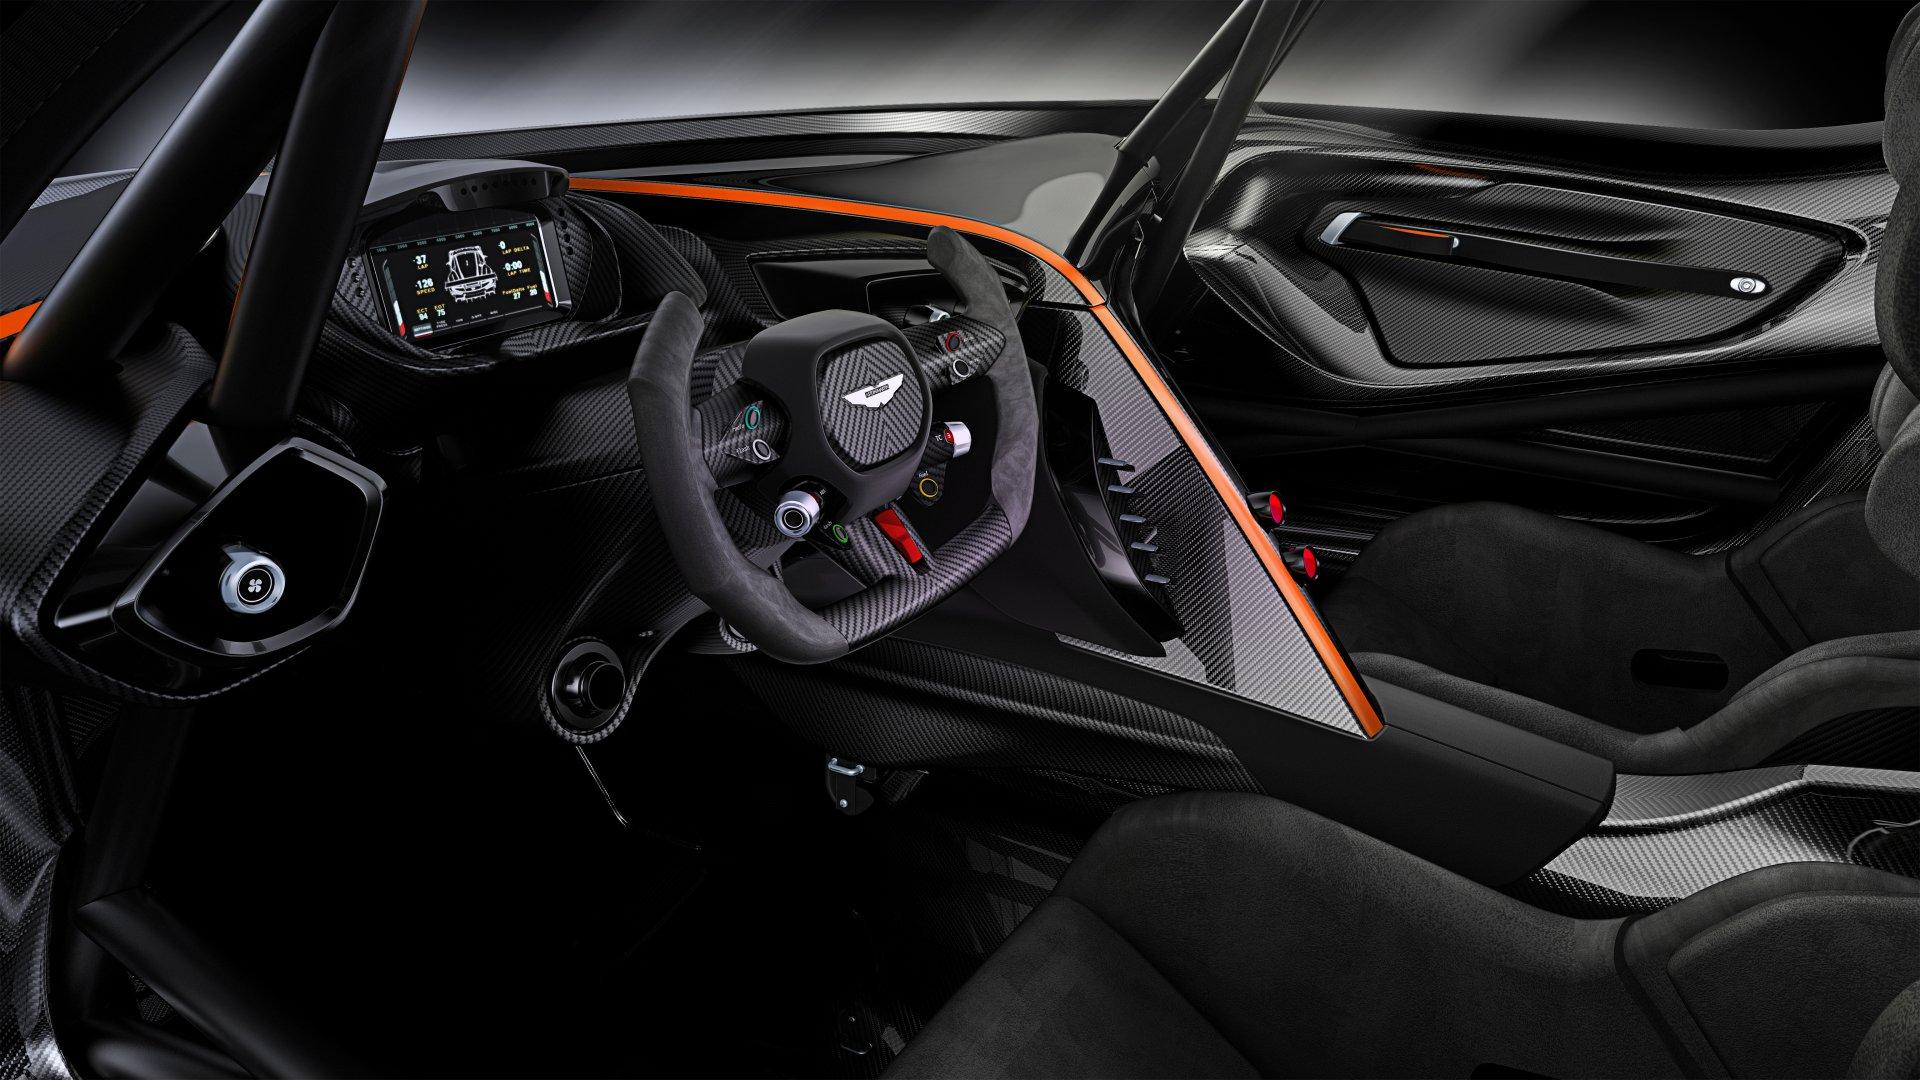 Vehicles - Aston Martin Vulcan  Aston Martin Car Interior Steering Wheel Wallpaper